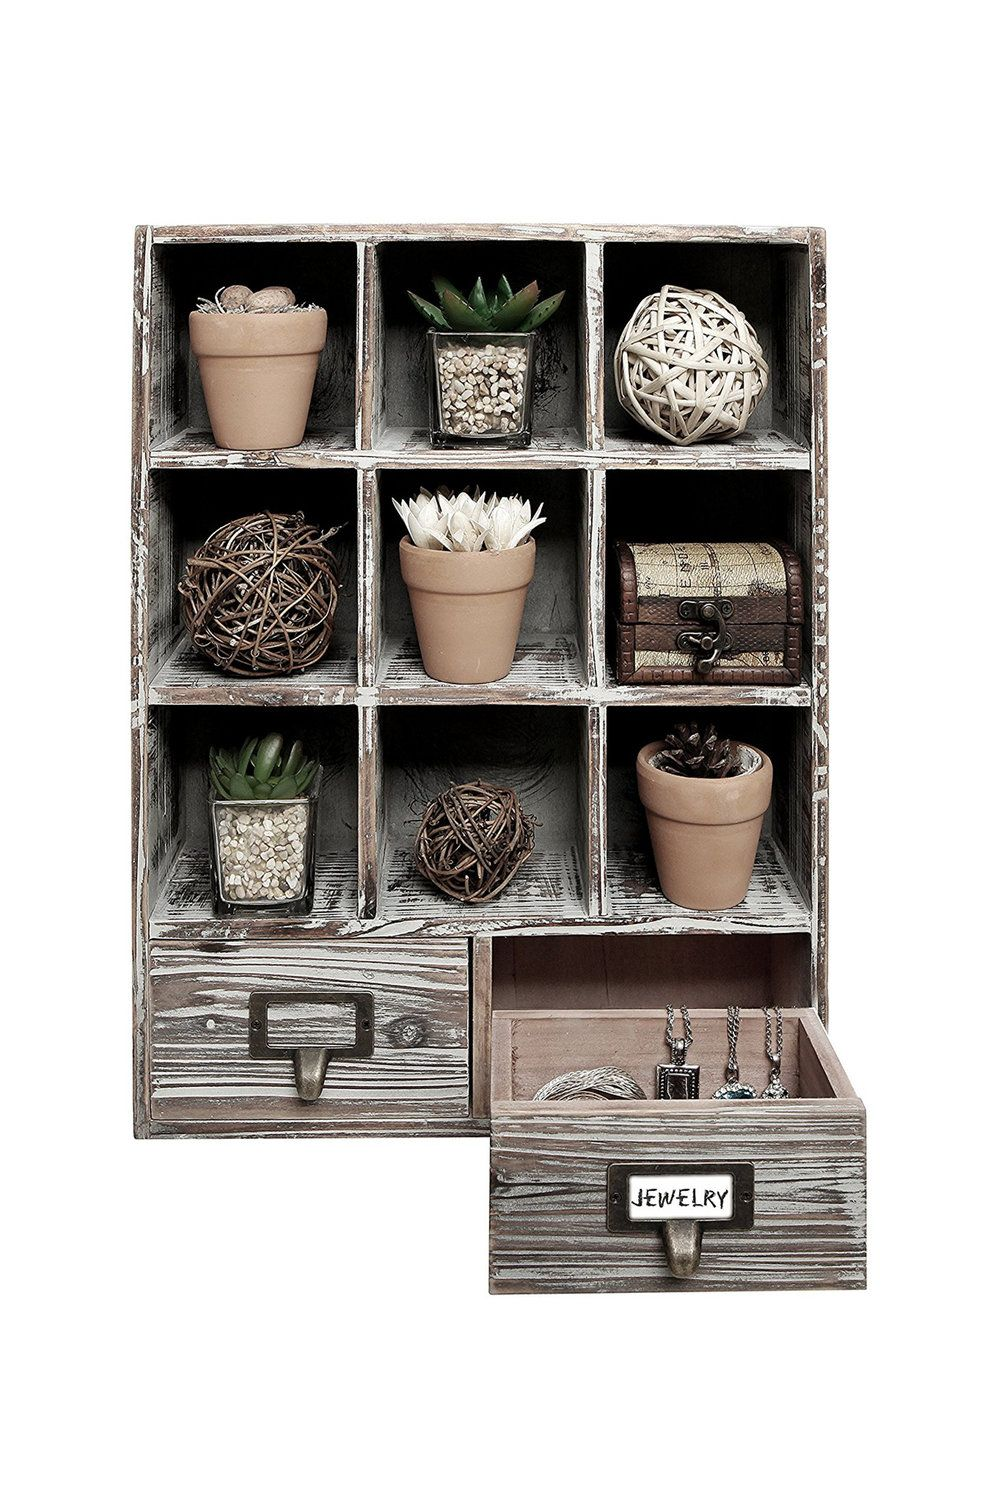 Rustic Dark Brown Wood Shadow Box1 Jpg Wood Shadow Box Cubby Storage Rustic Wall Shelves